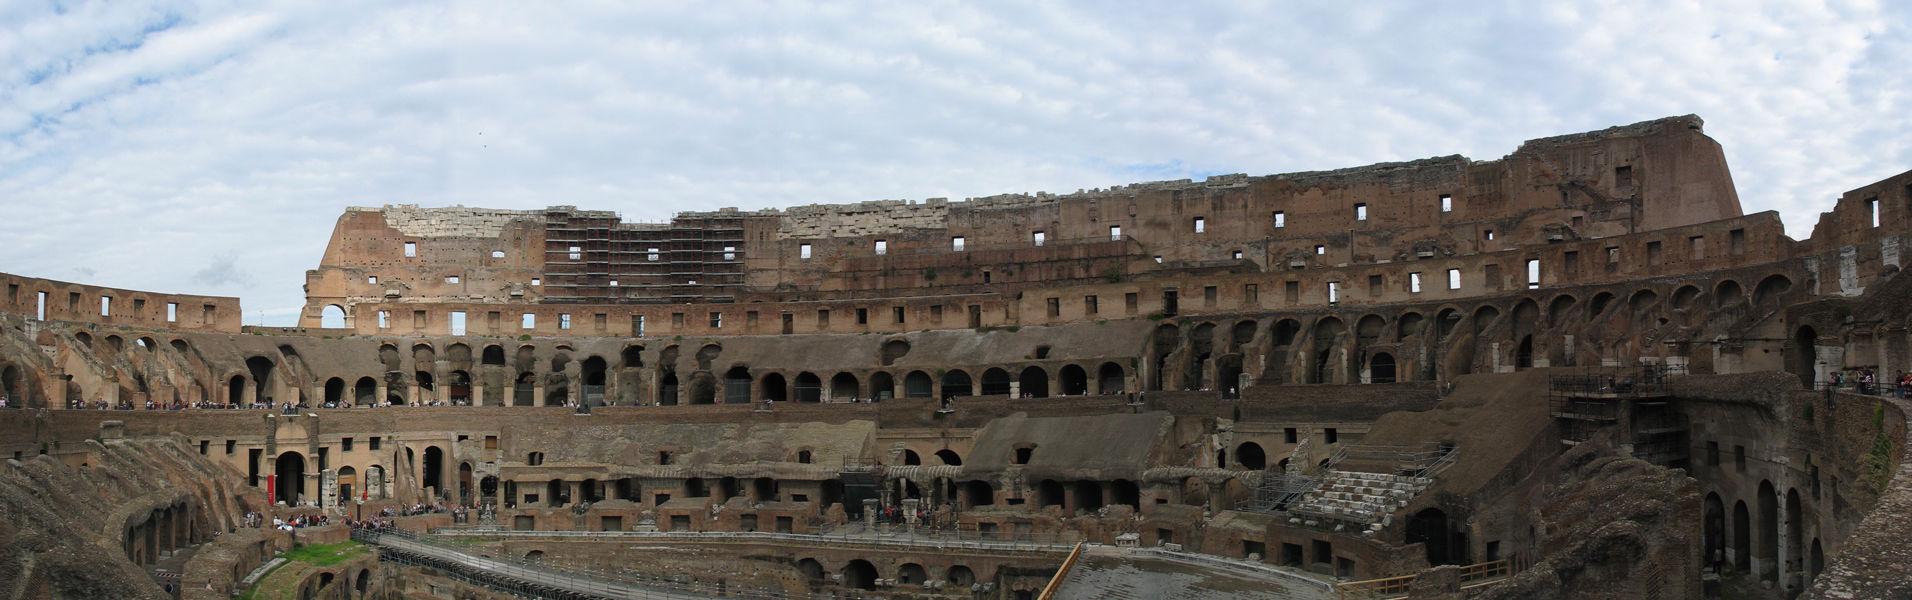 Rome, Italy's Colosseum interior panorama